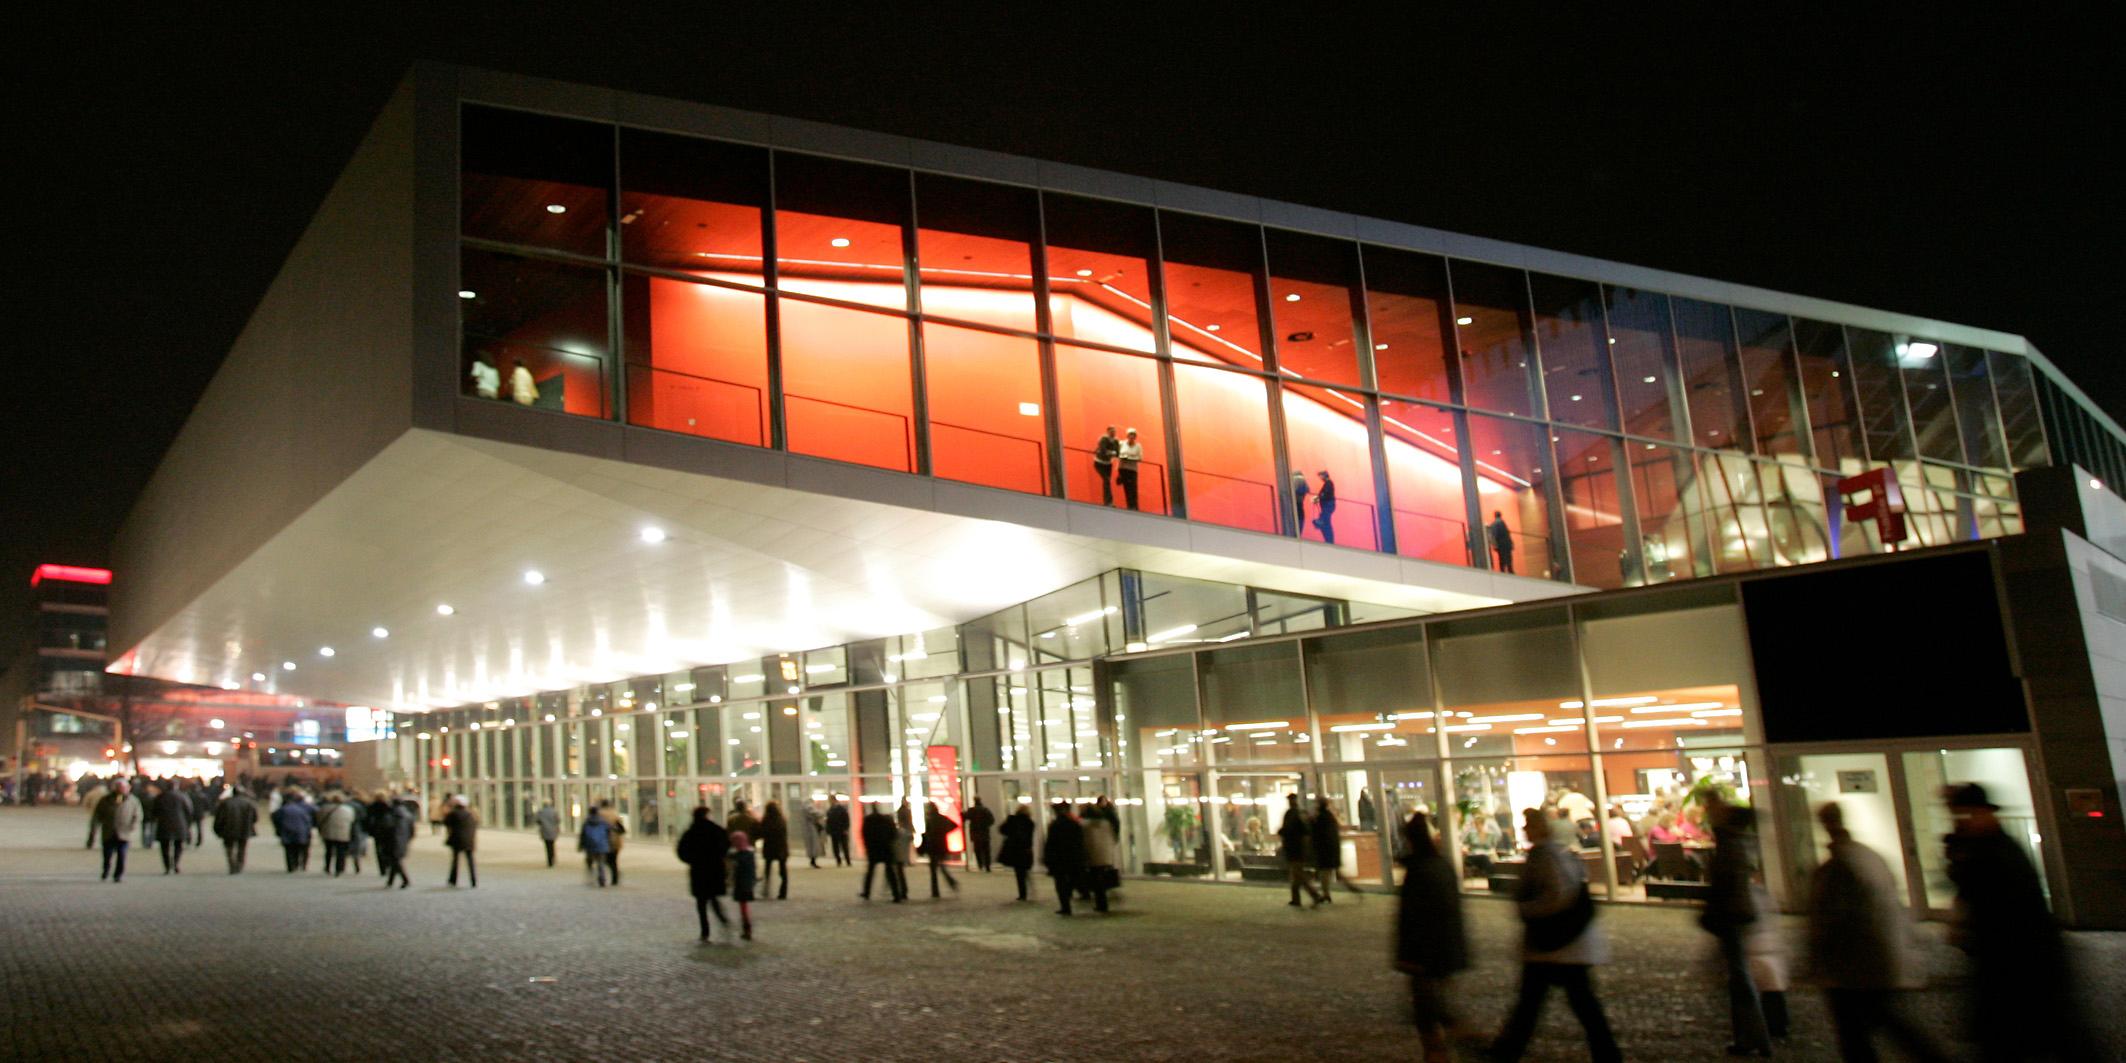 The Wiener Stadthalle will host Eurovision 2015